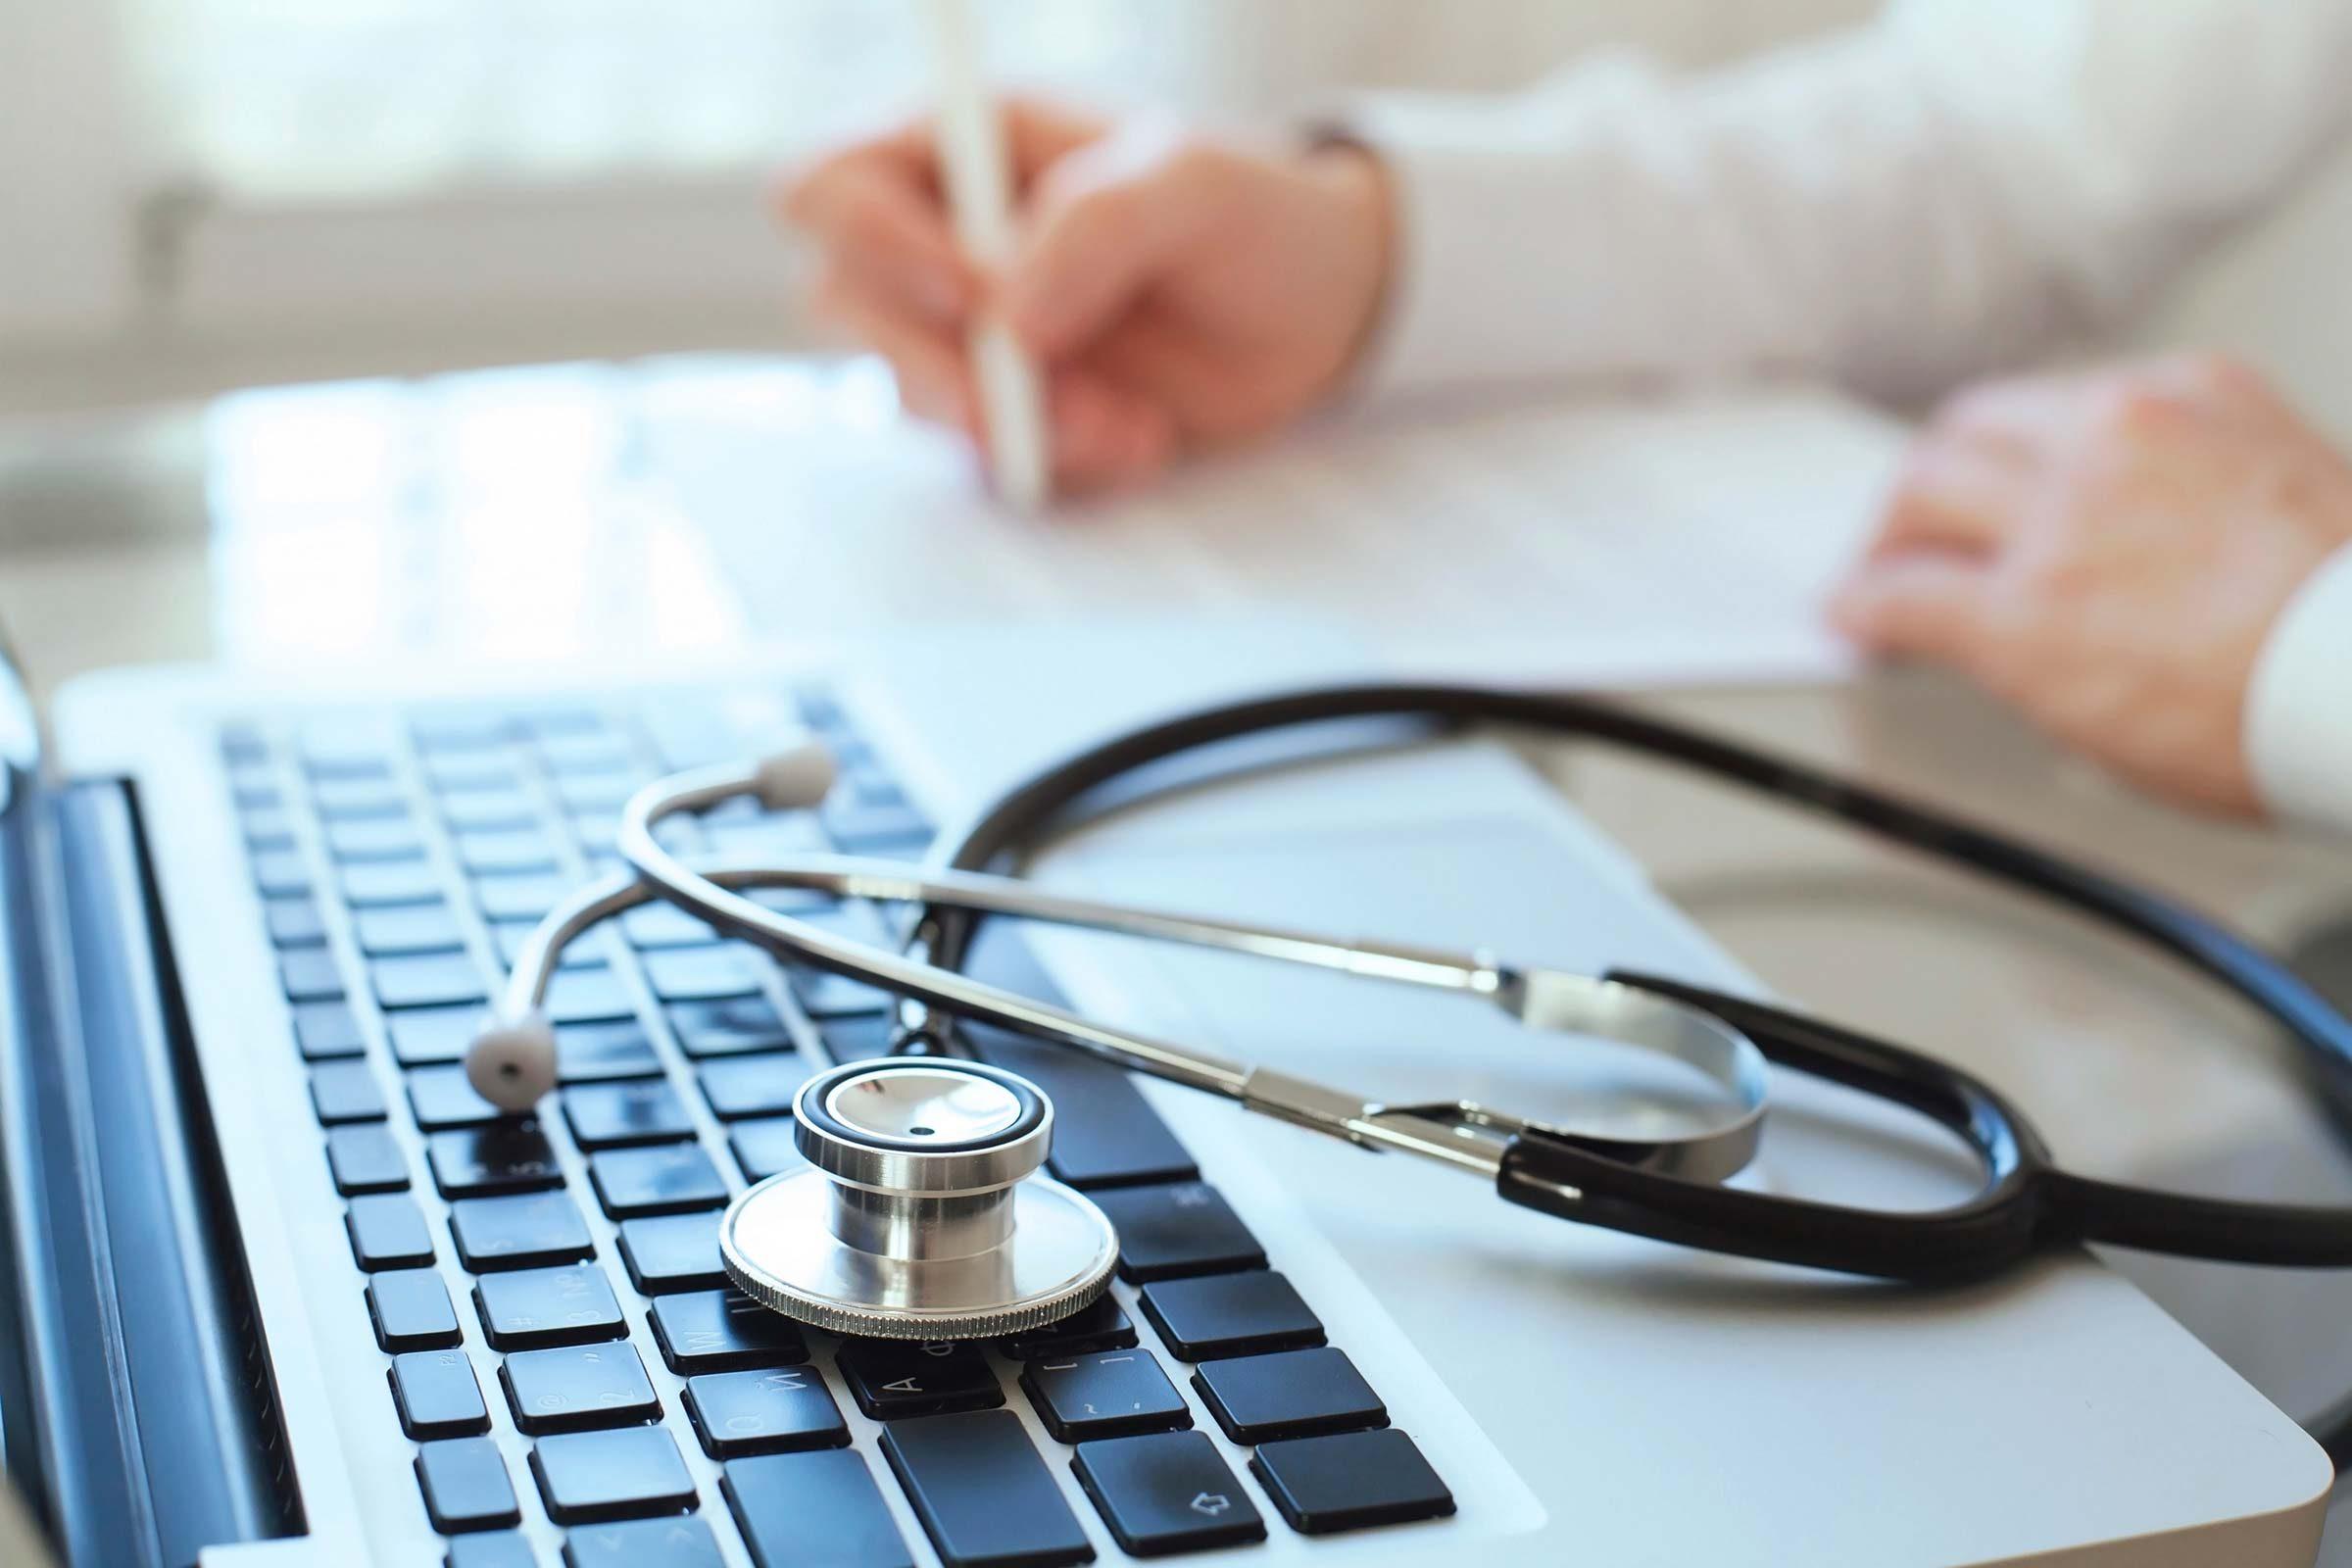 Where to learn emergency treatment?